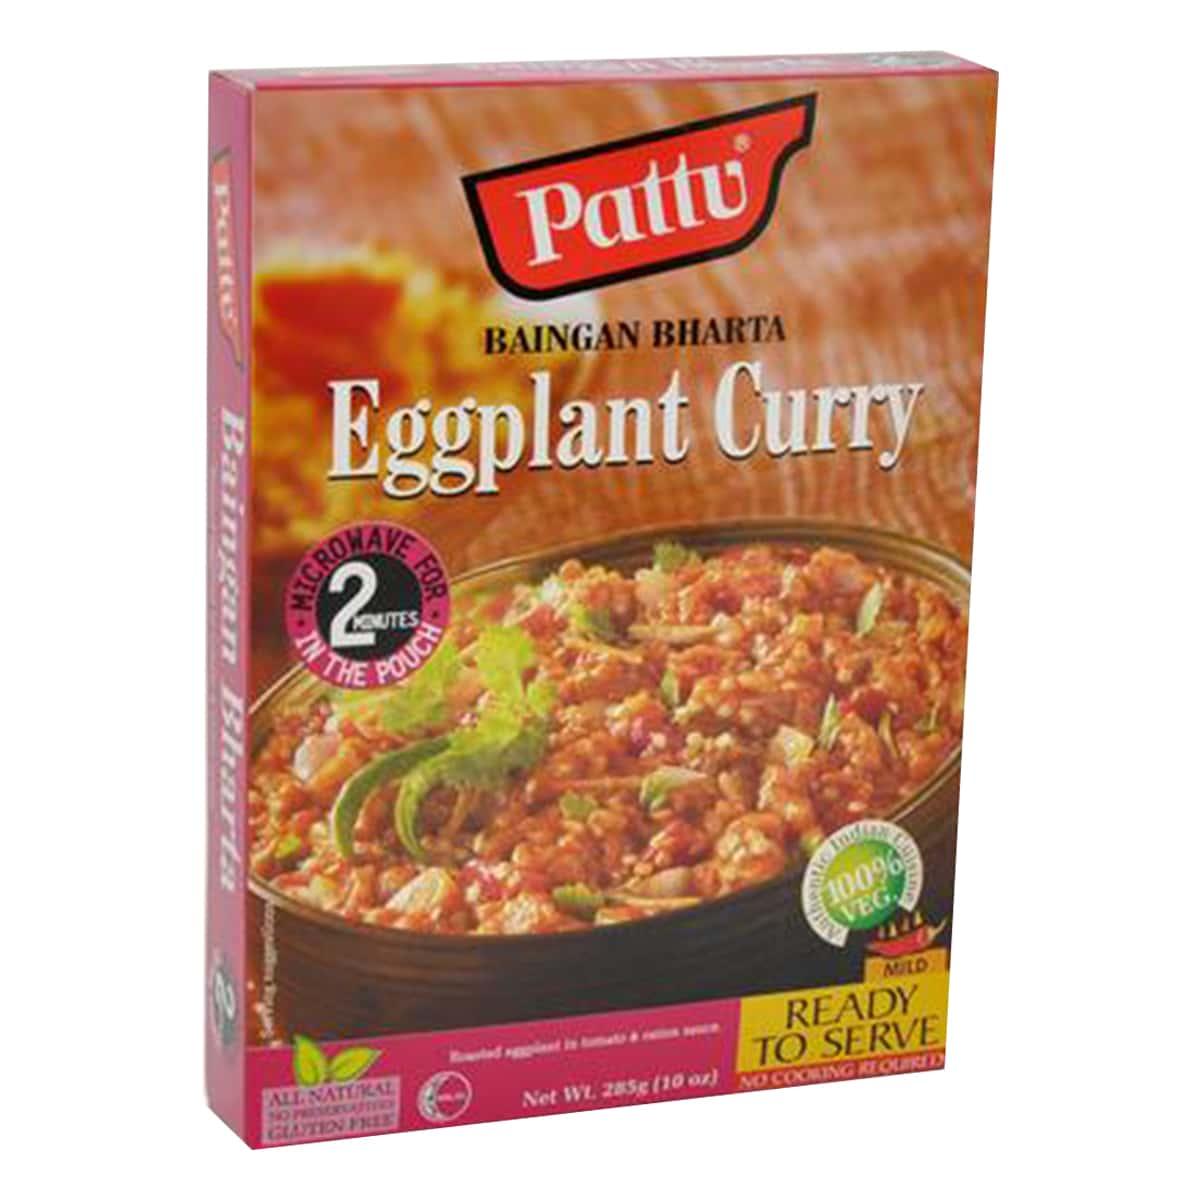 Buy Pattu Baingan Bharta (Eggplant Curry) Ready to Serve - 285 gm